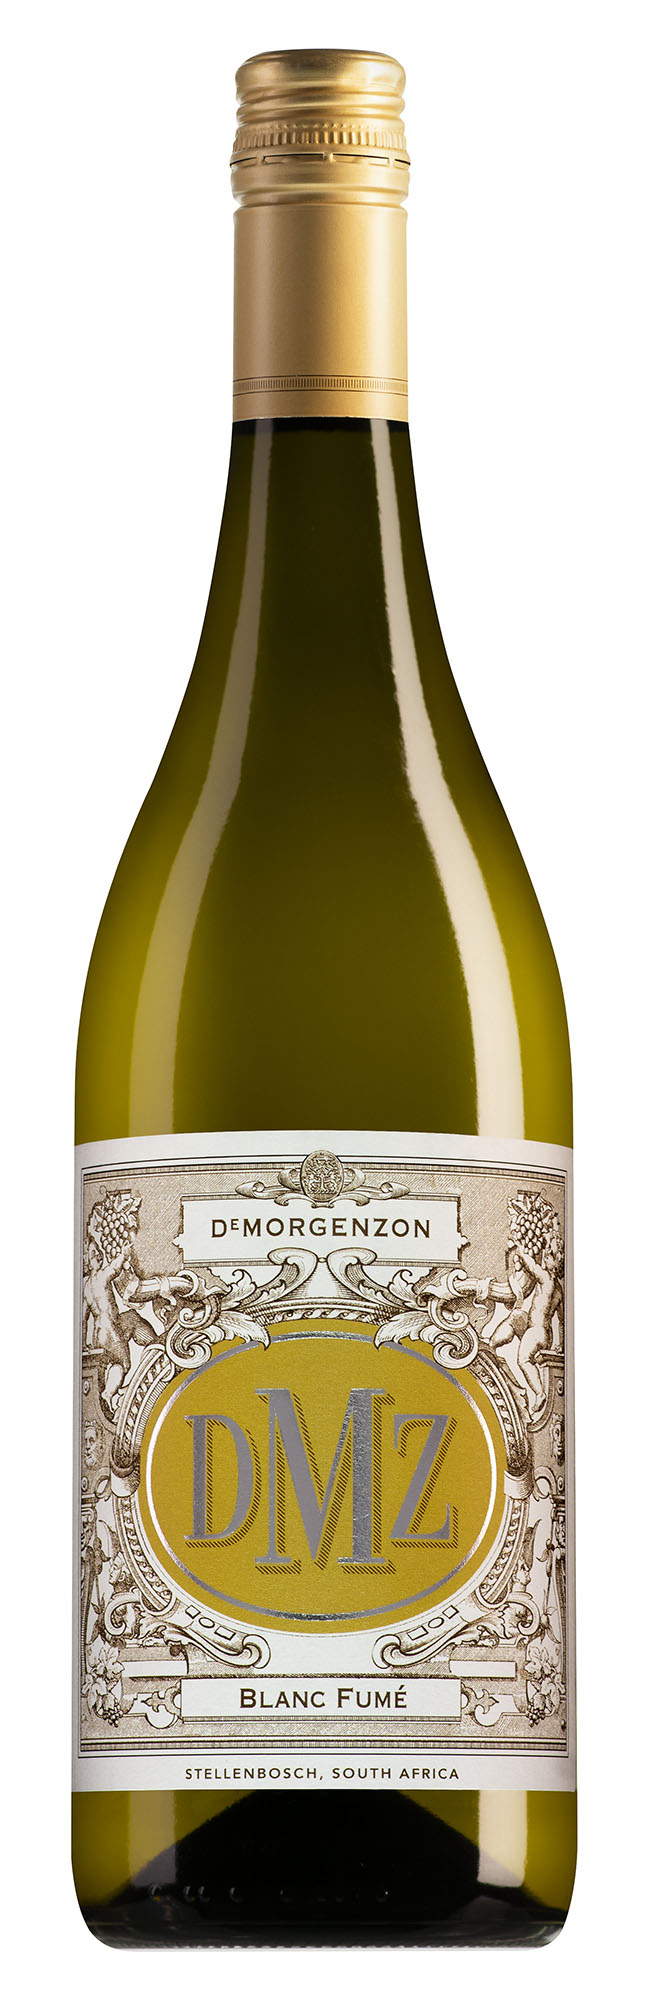 DeMorgenzon Stellenbosch DMZ Limited Release Blanc Fumé Sauvignon Blanc